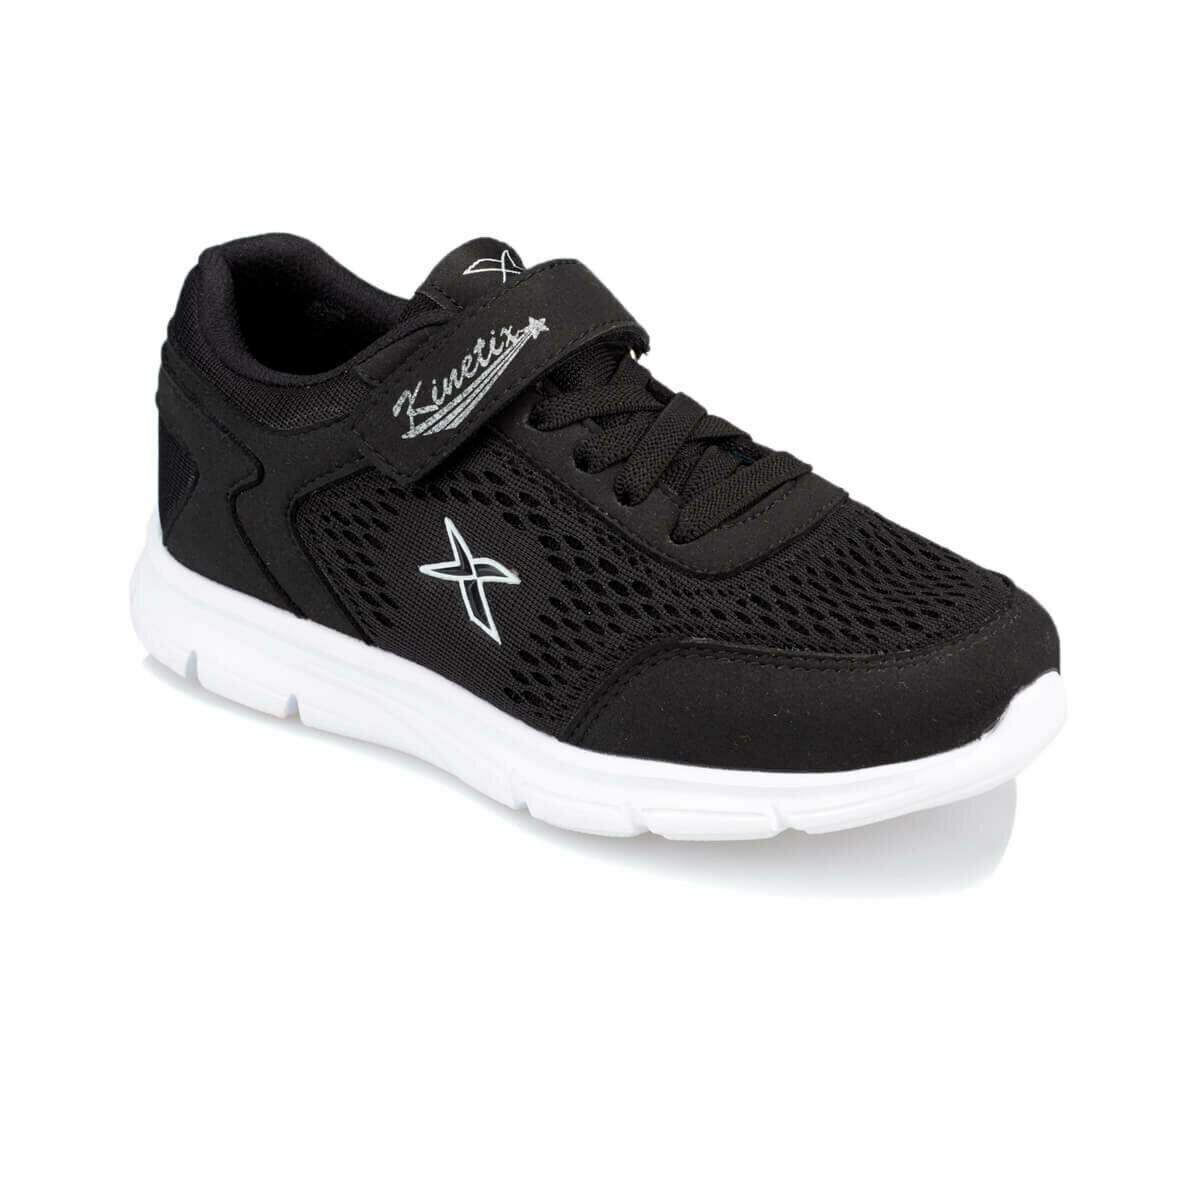 FLO ZUZEN Black Male Child Hiking Shoes KINETIX